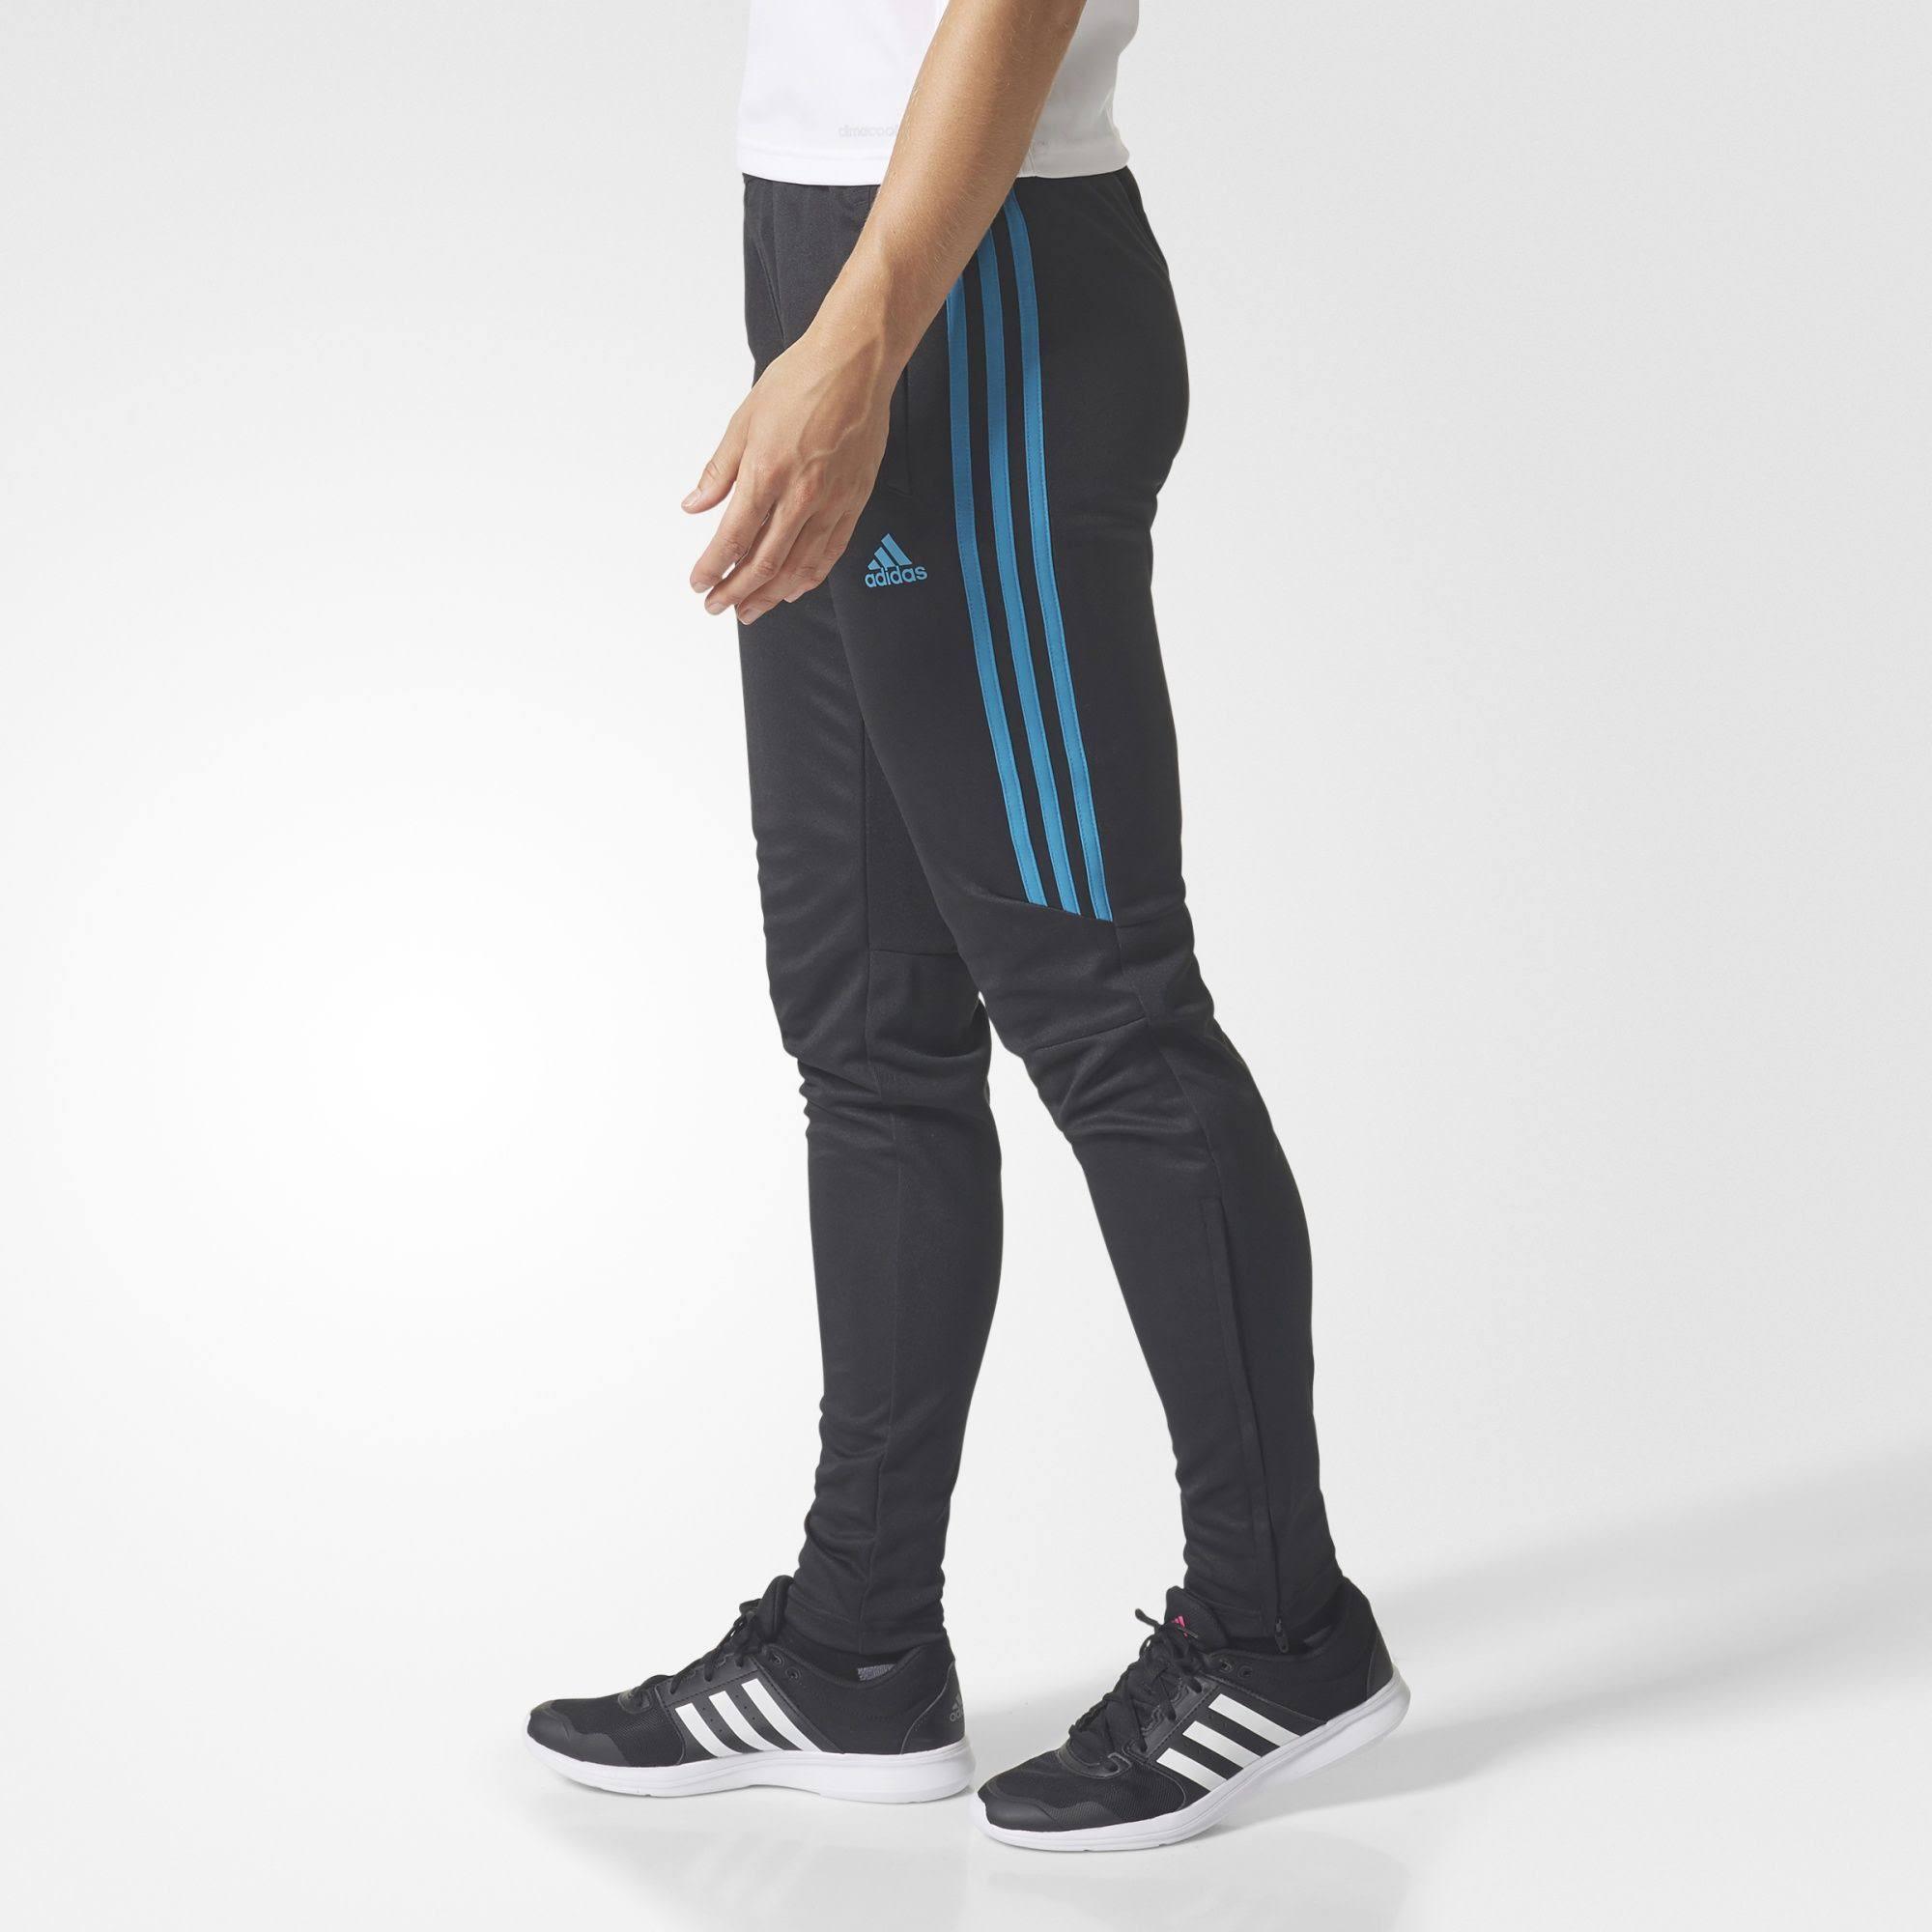 L Adidas Schwarz Tiro Trainingshose Regular Fußball Damen 17 AwqU6Ag